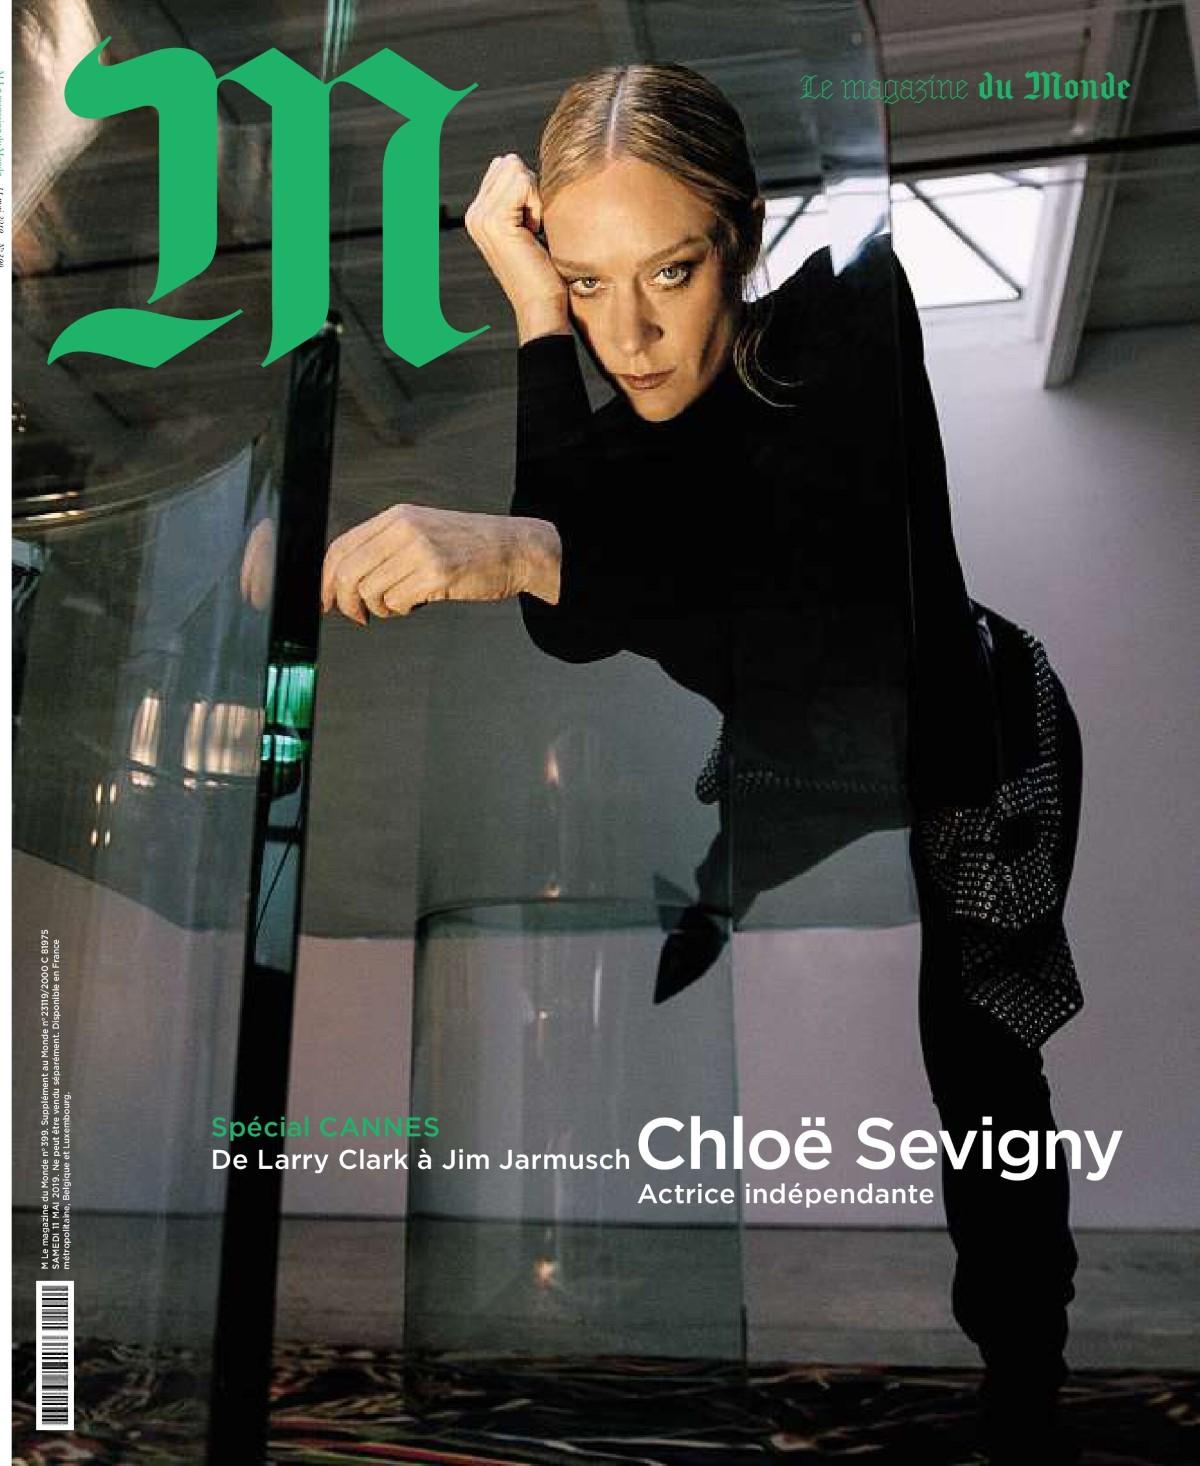 Chloe-Sevigny-Briana-Capozzi-M-Le-Monde- (4).jpg